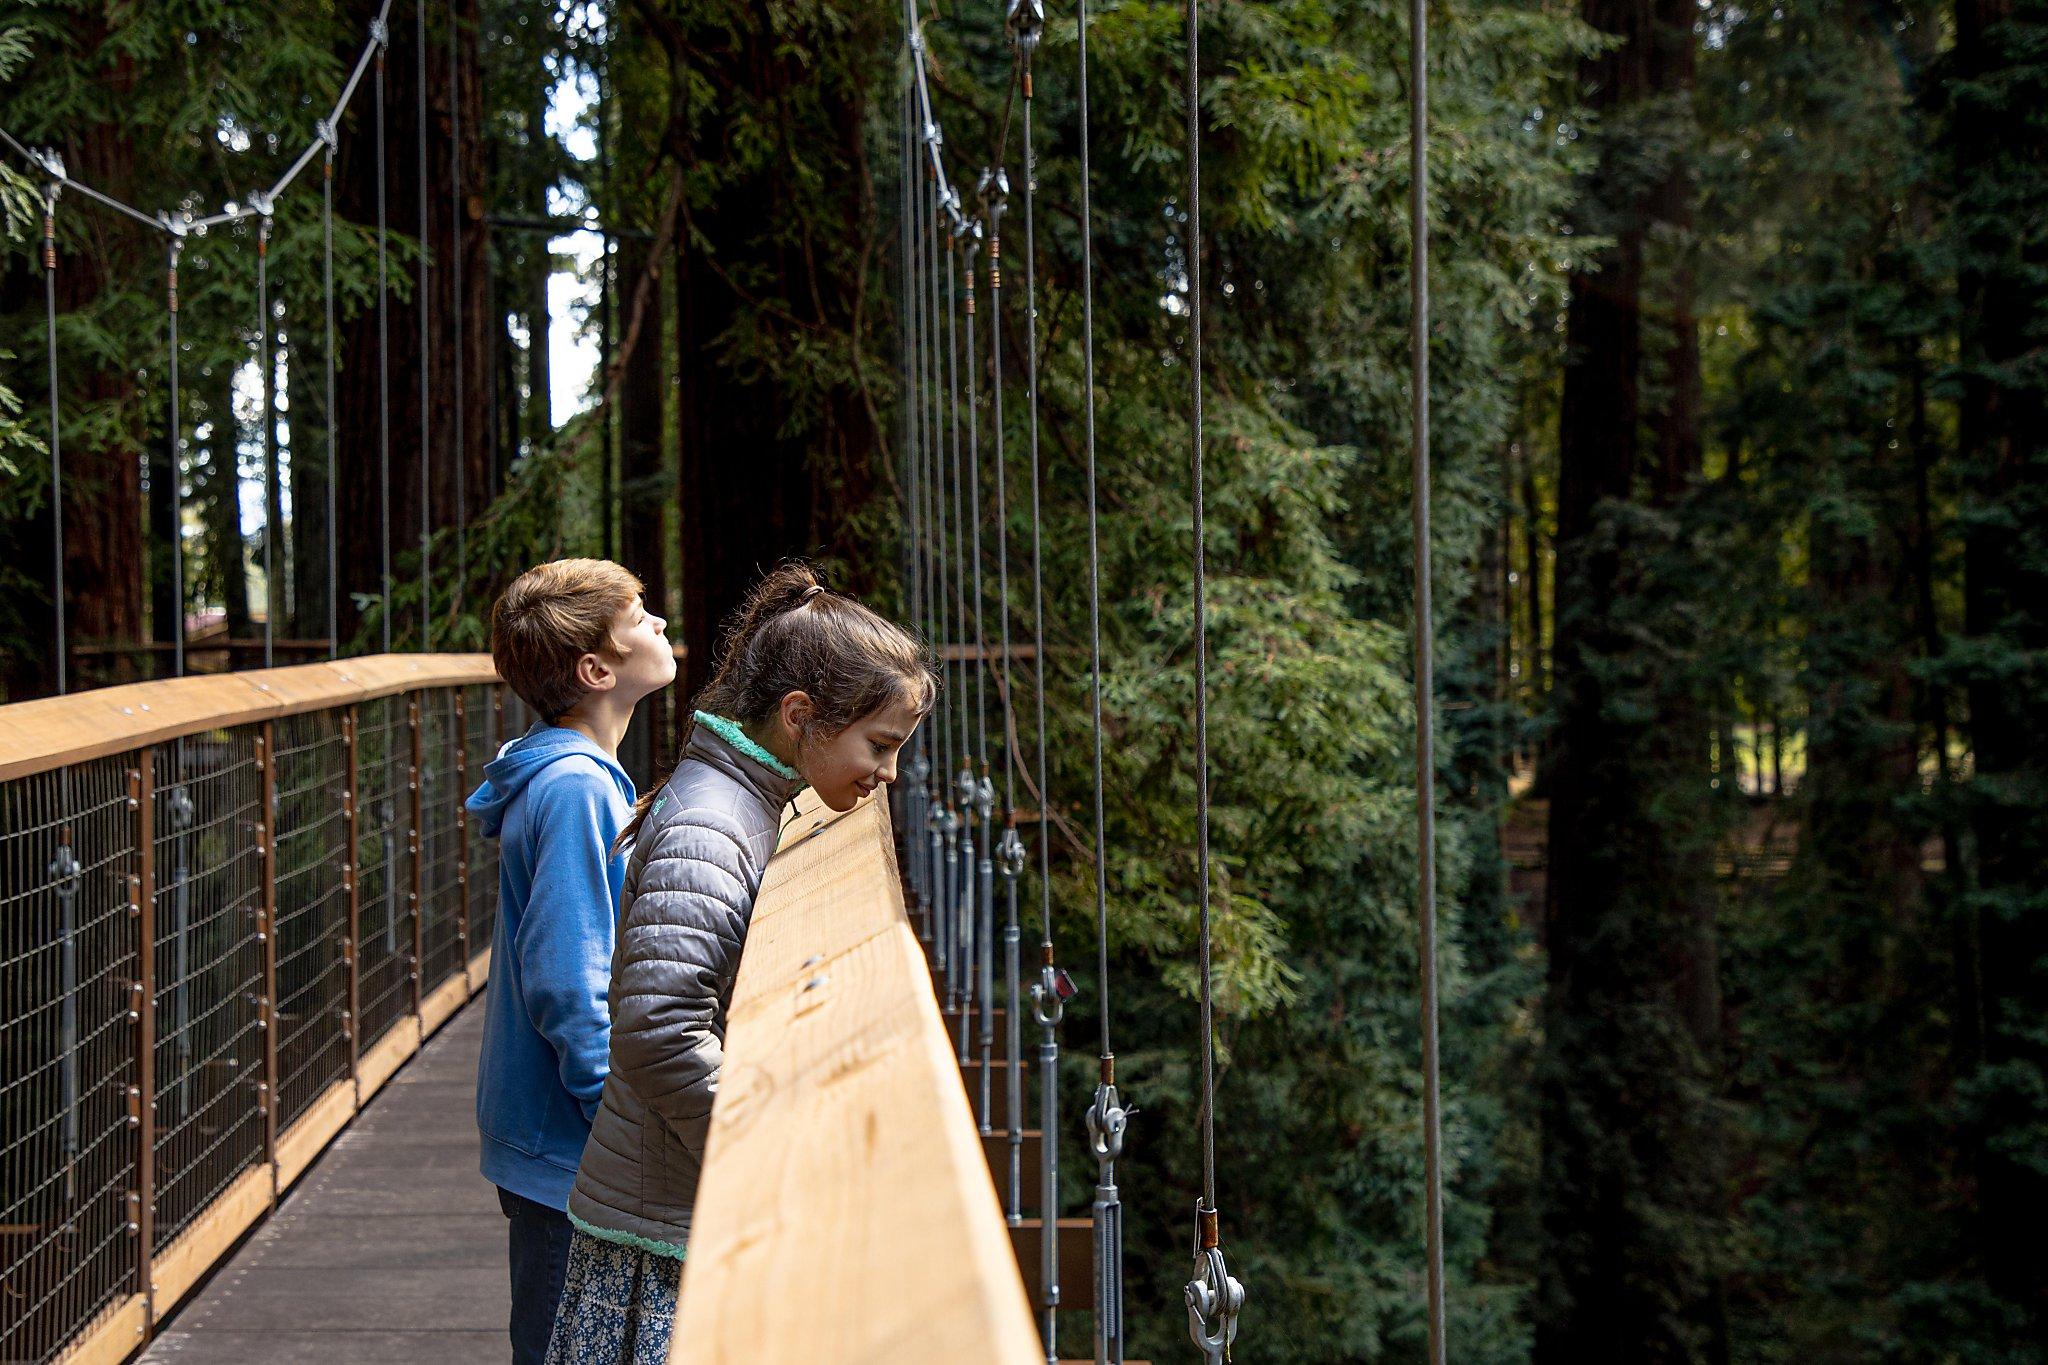 New redwood canopy boardwalk hangs 100 feet off the forest floor in Eureka